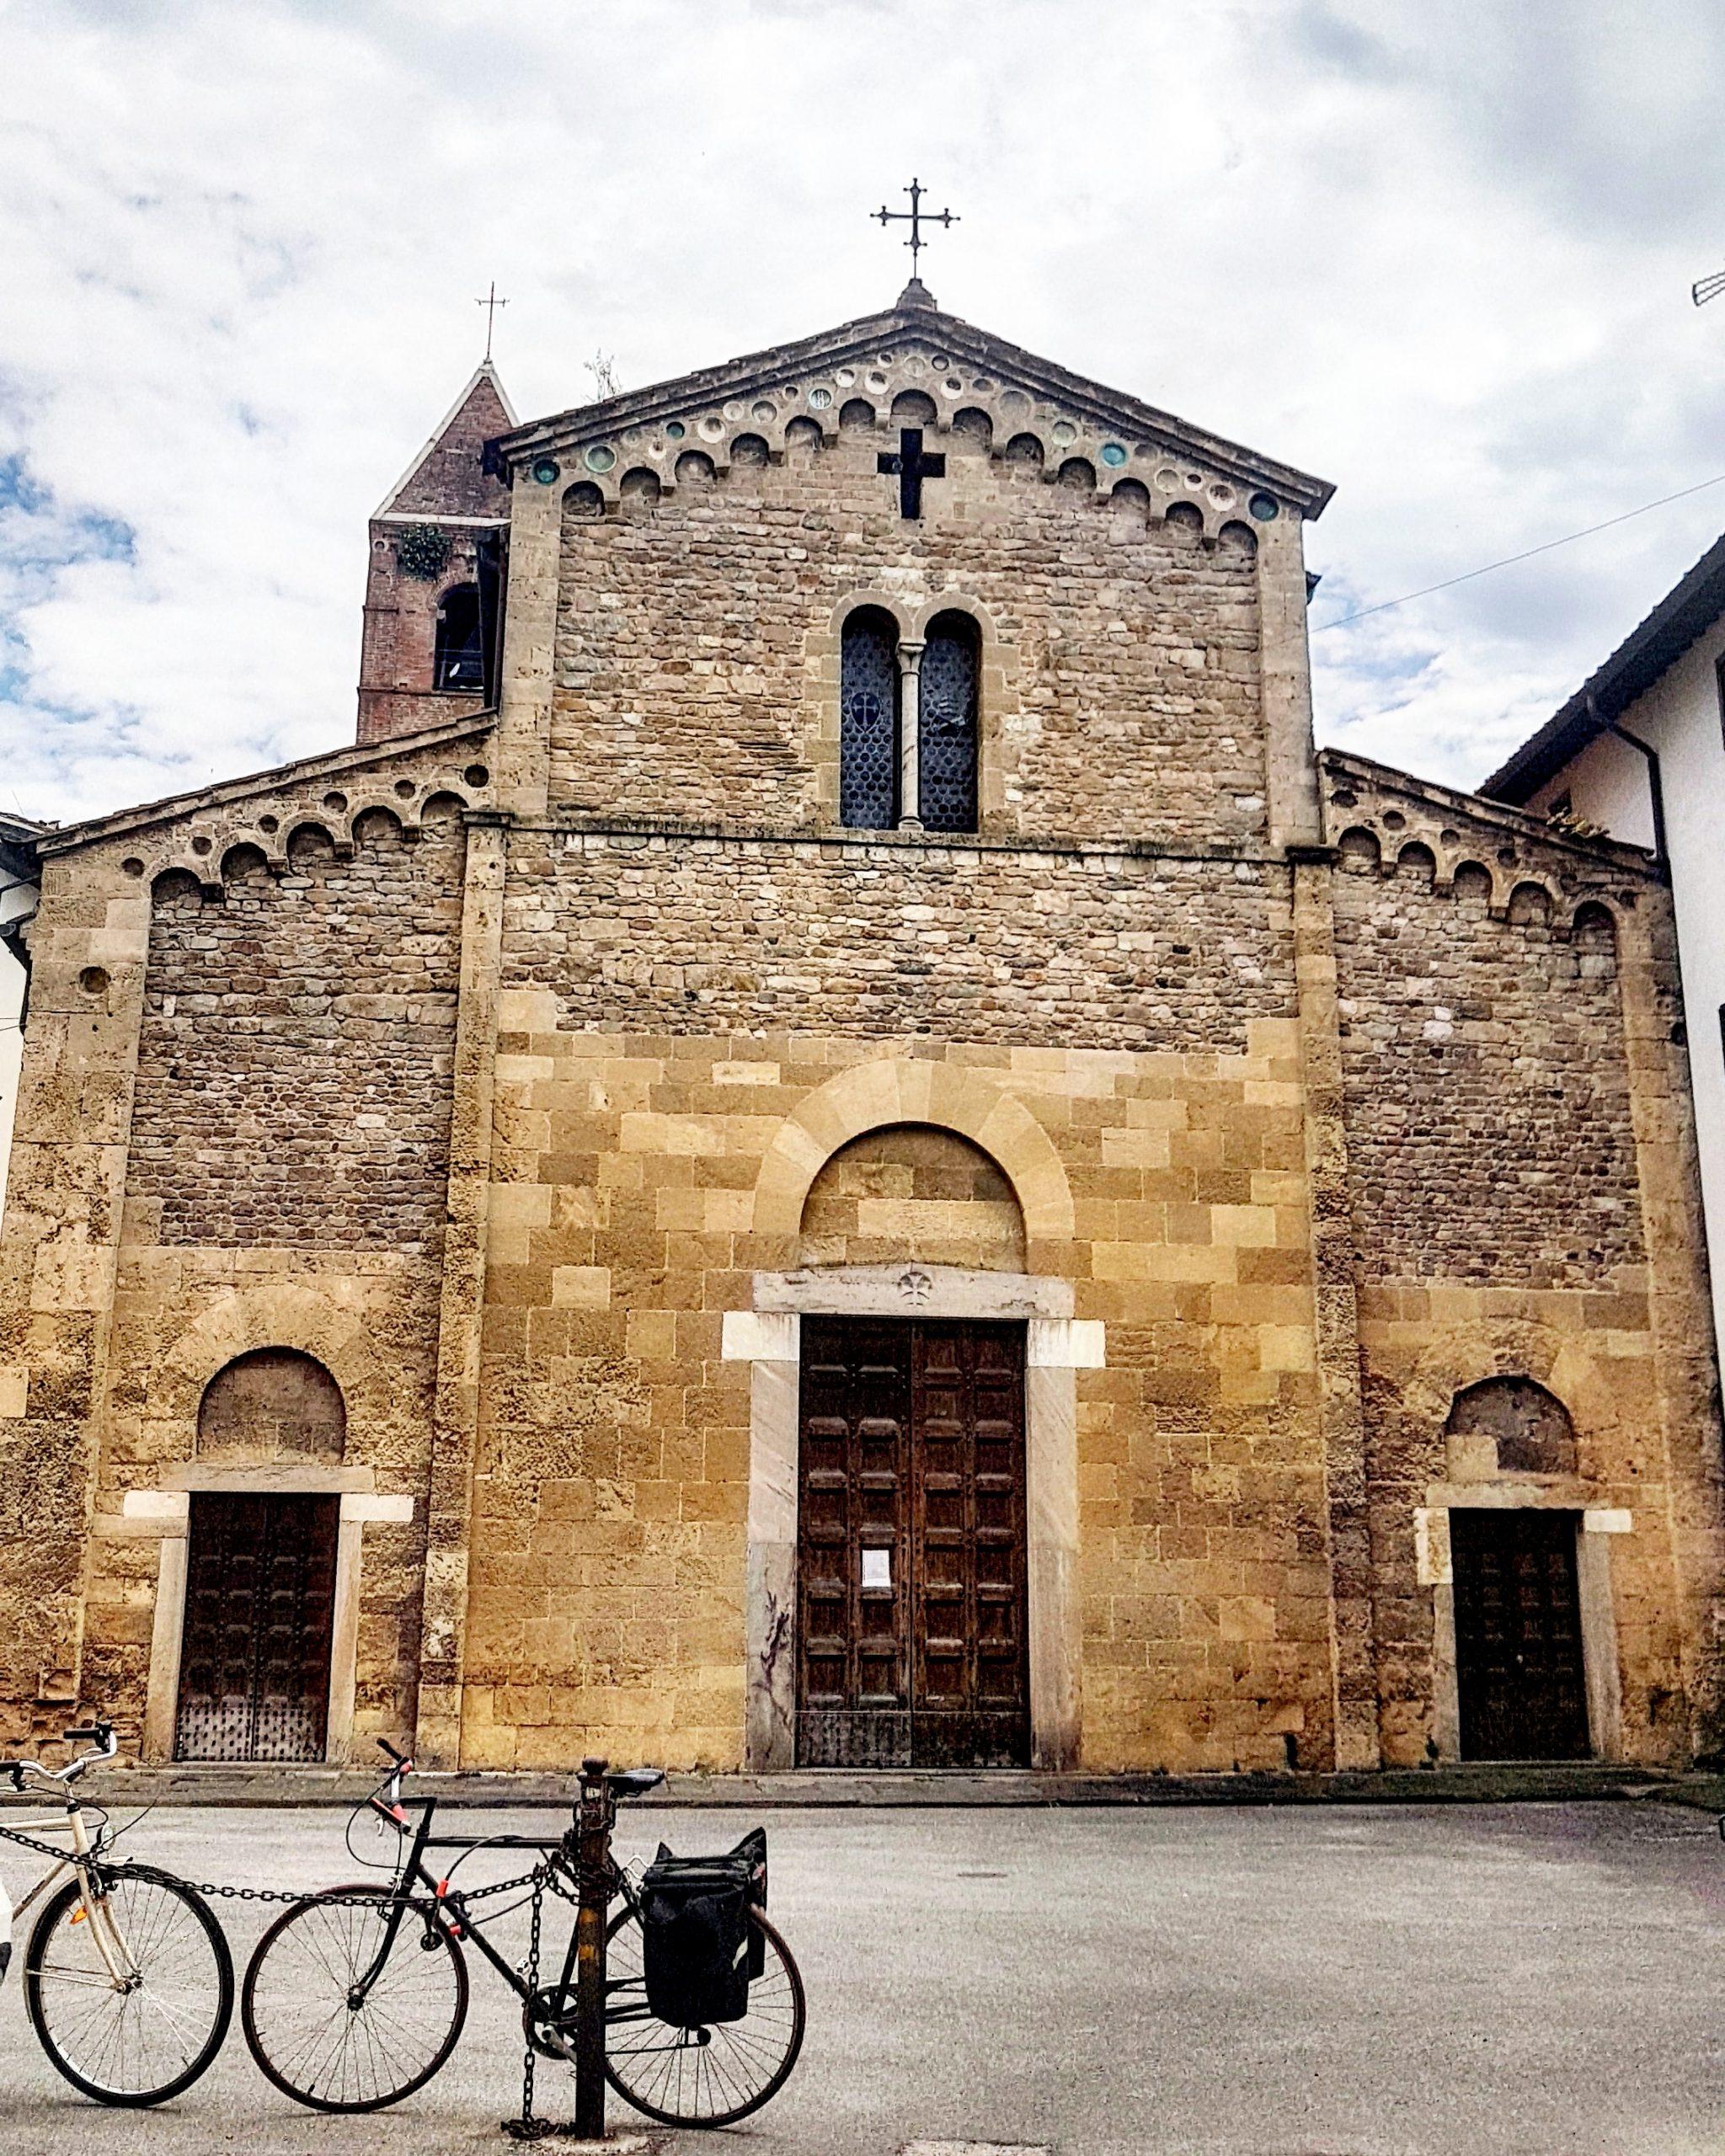 Visita scavi archeologici Chiesa di San Sisto | Pisa